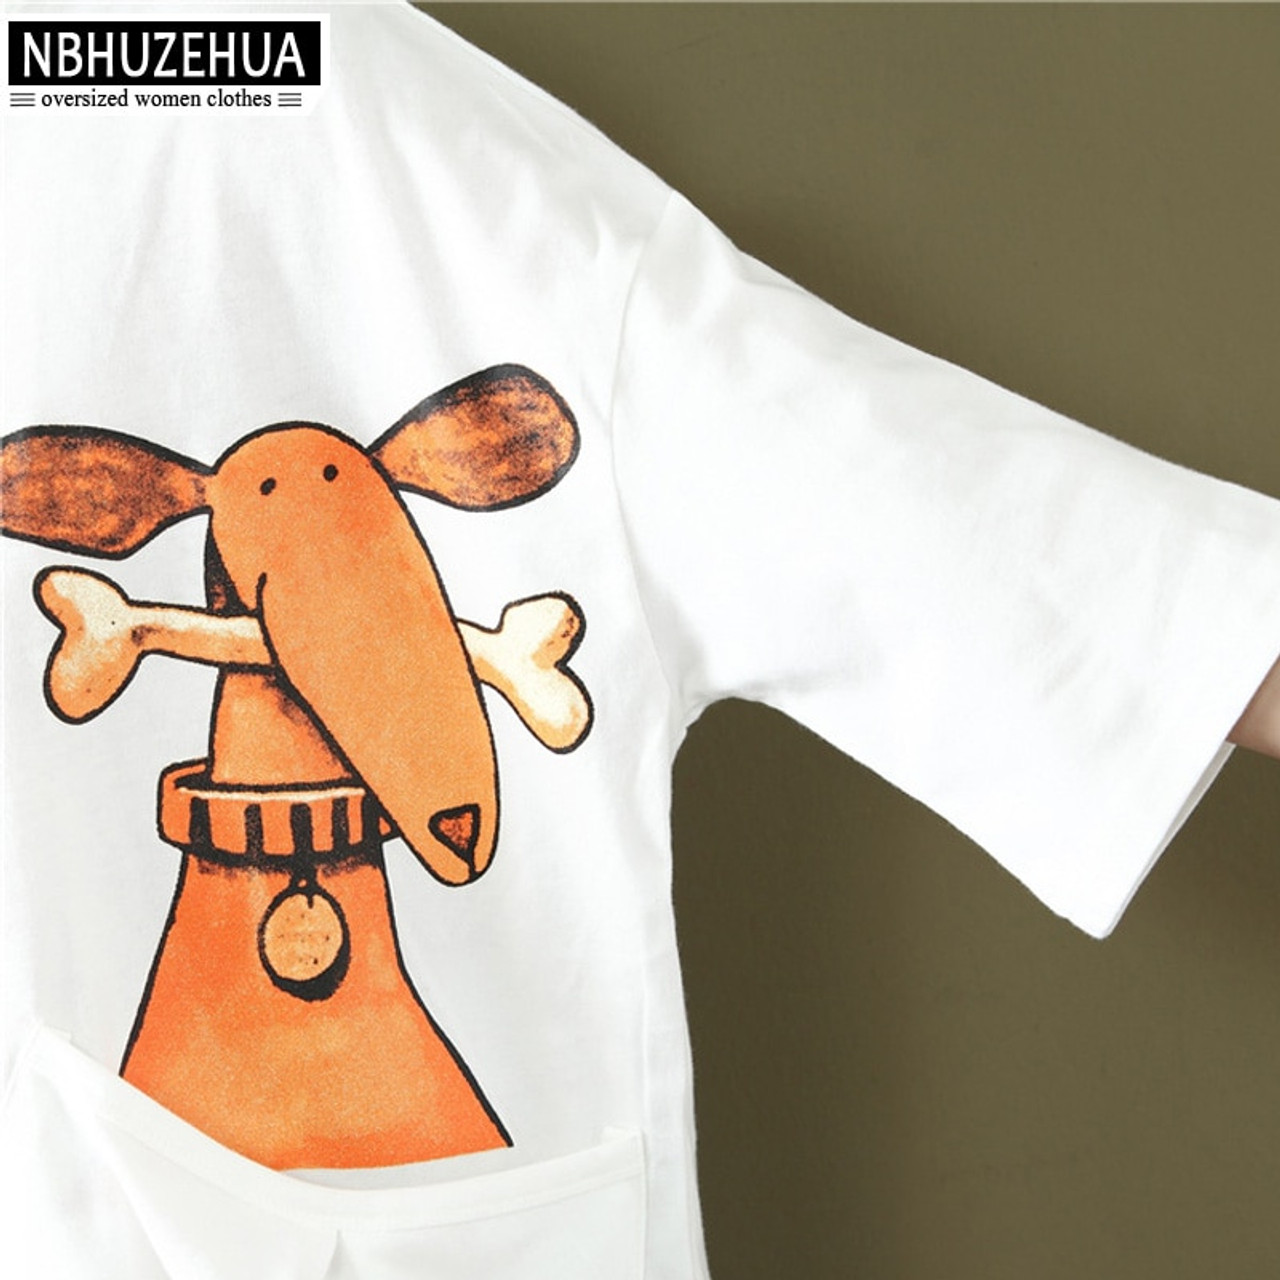 0fb2a8ece4 ... NBHUZEHUA A56 Women's Kawaii Funny T Shirts Cartoon Dog Print Women  Tops Summer Tshirt Plus Size ...